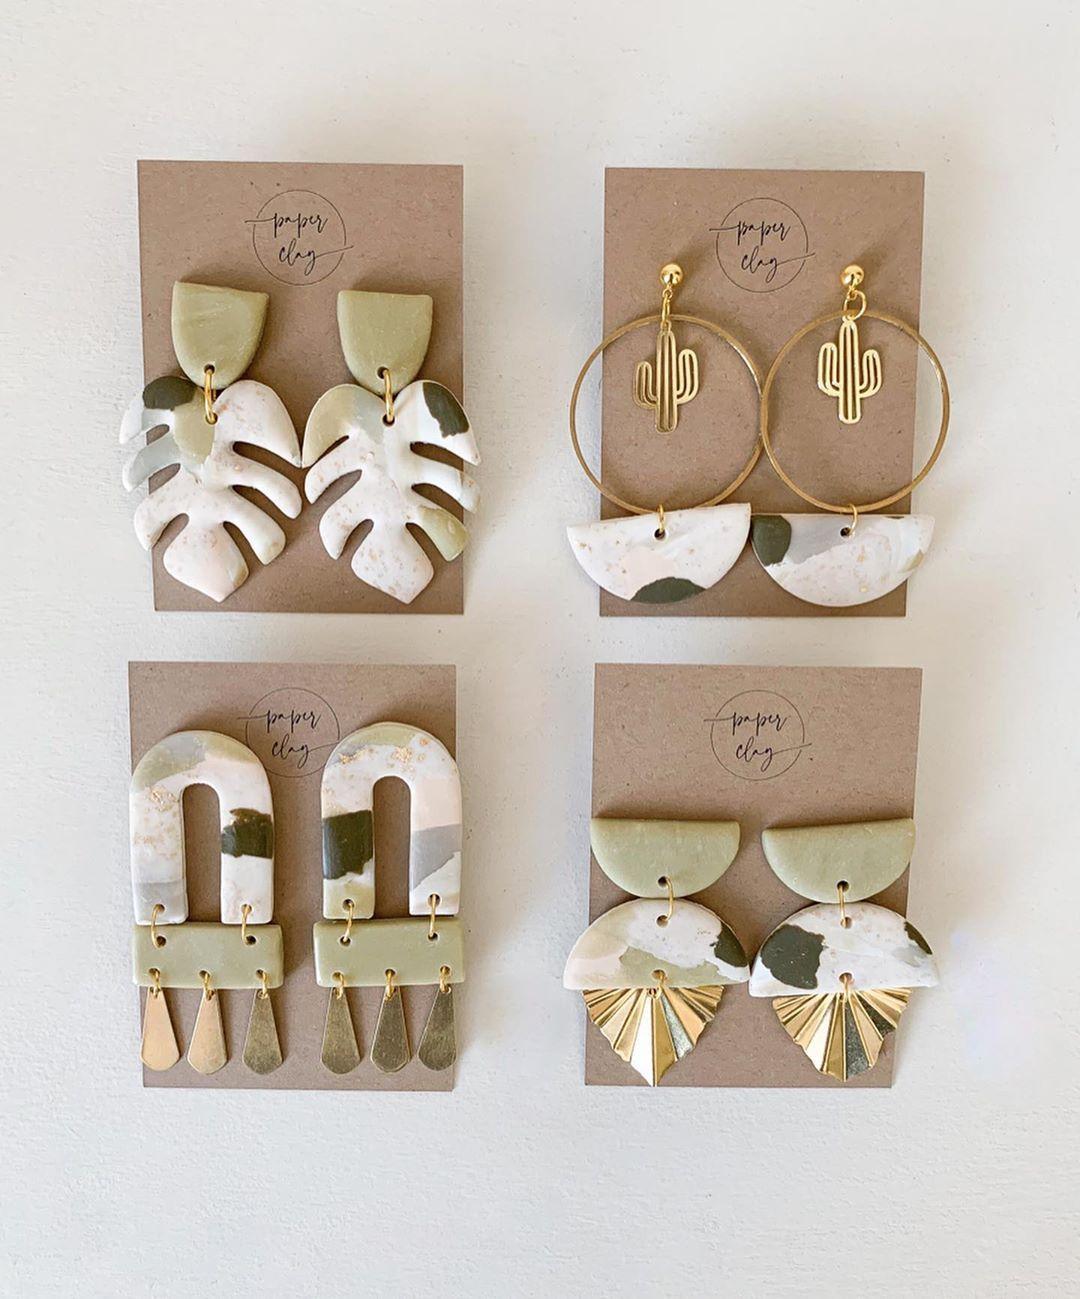 Handmade Earrings Spring Theme Clay Earrings Polymer Clay Jewelry